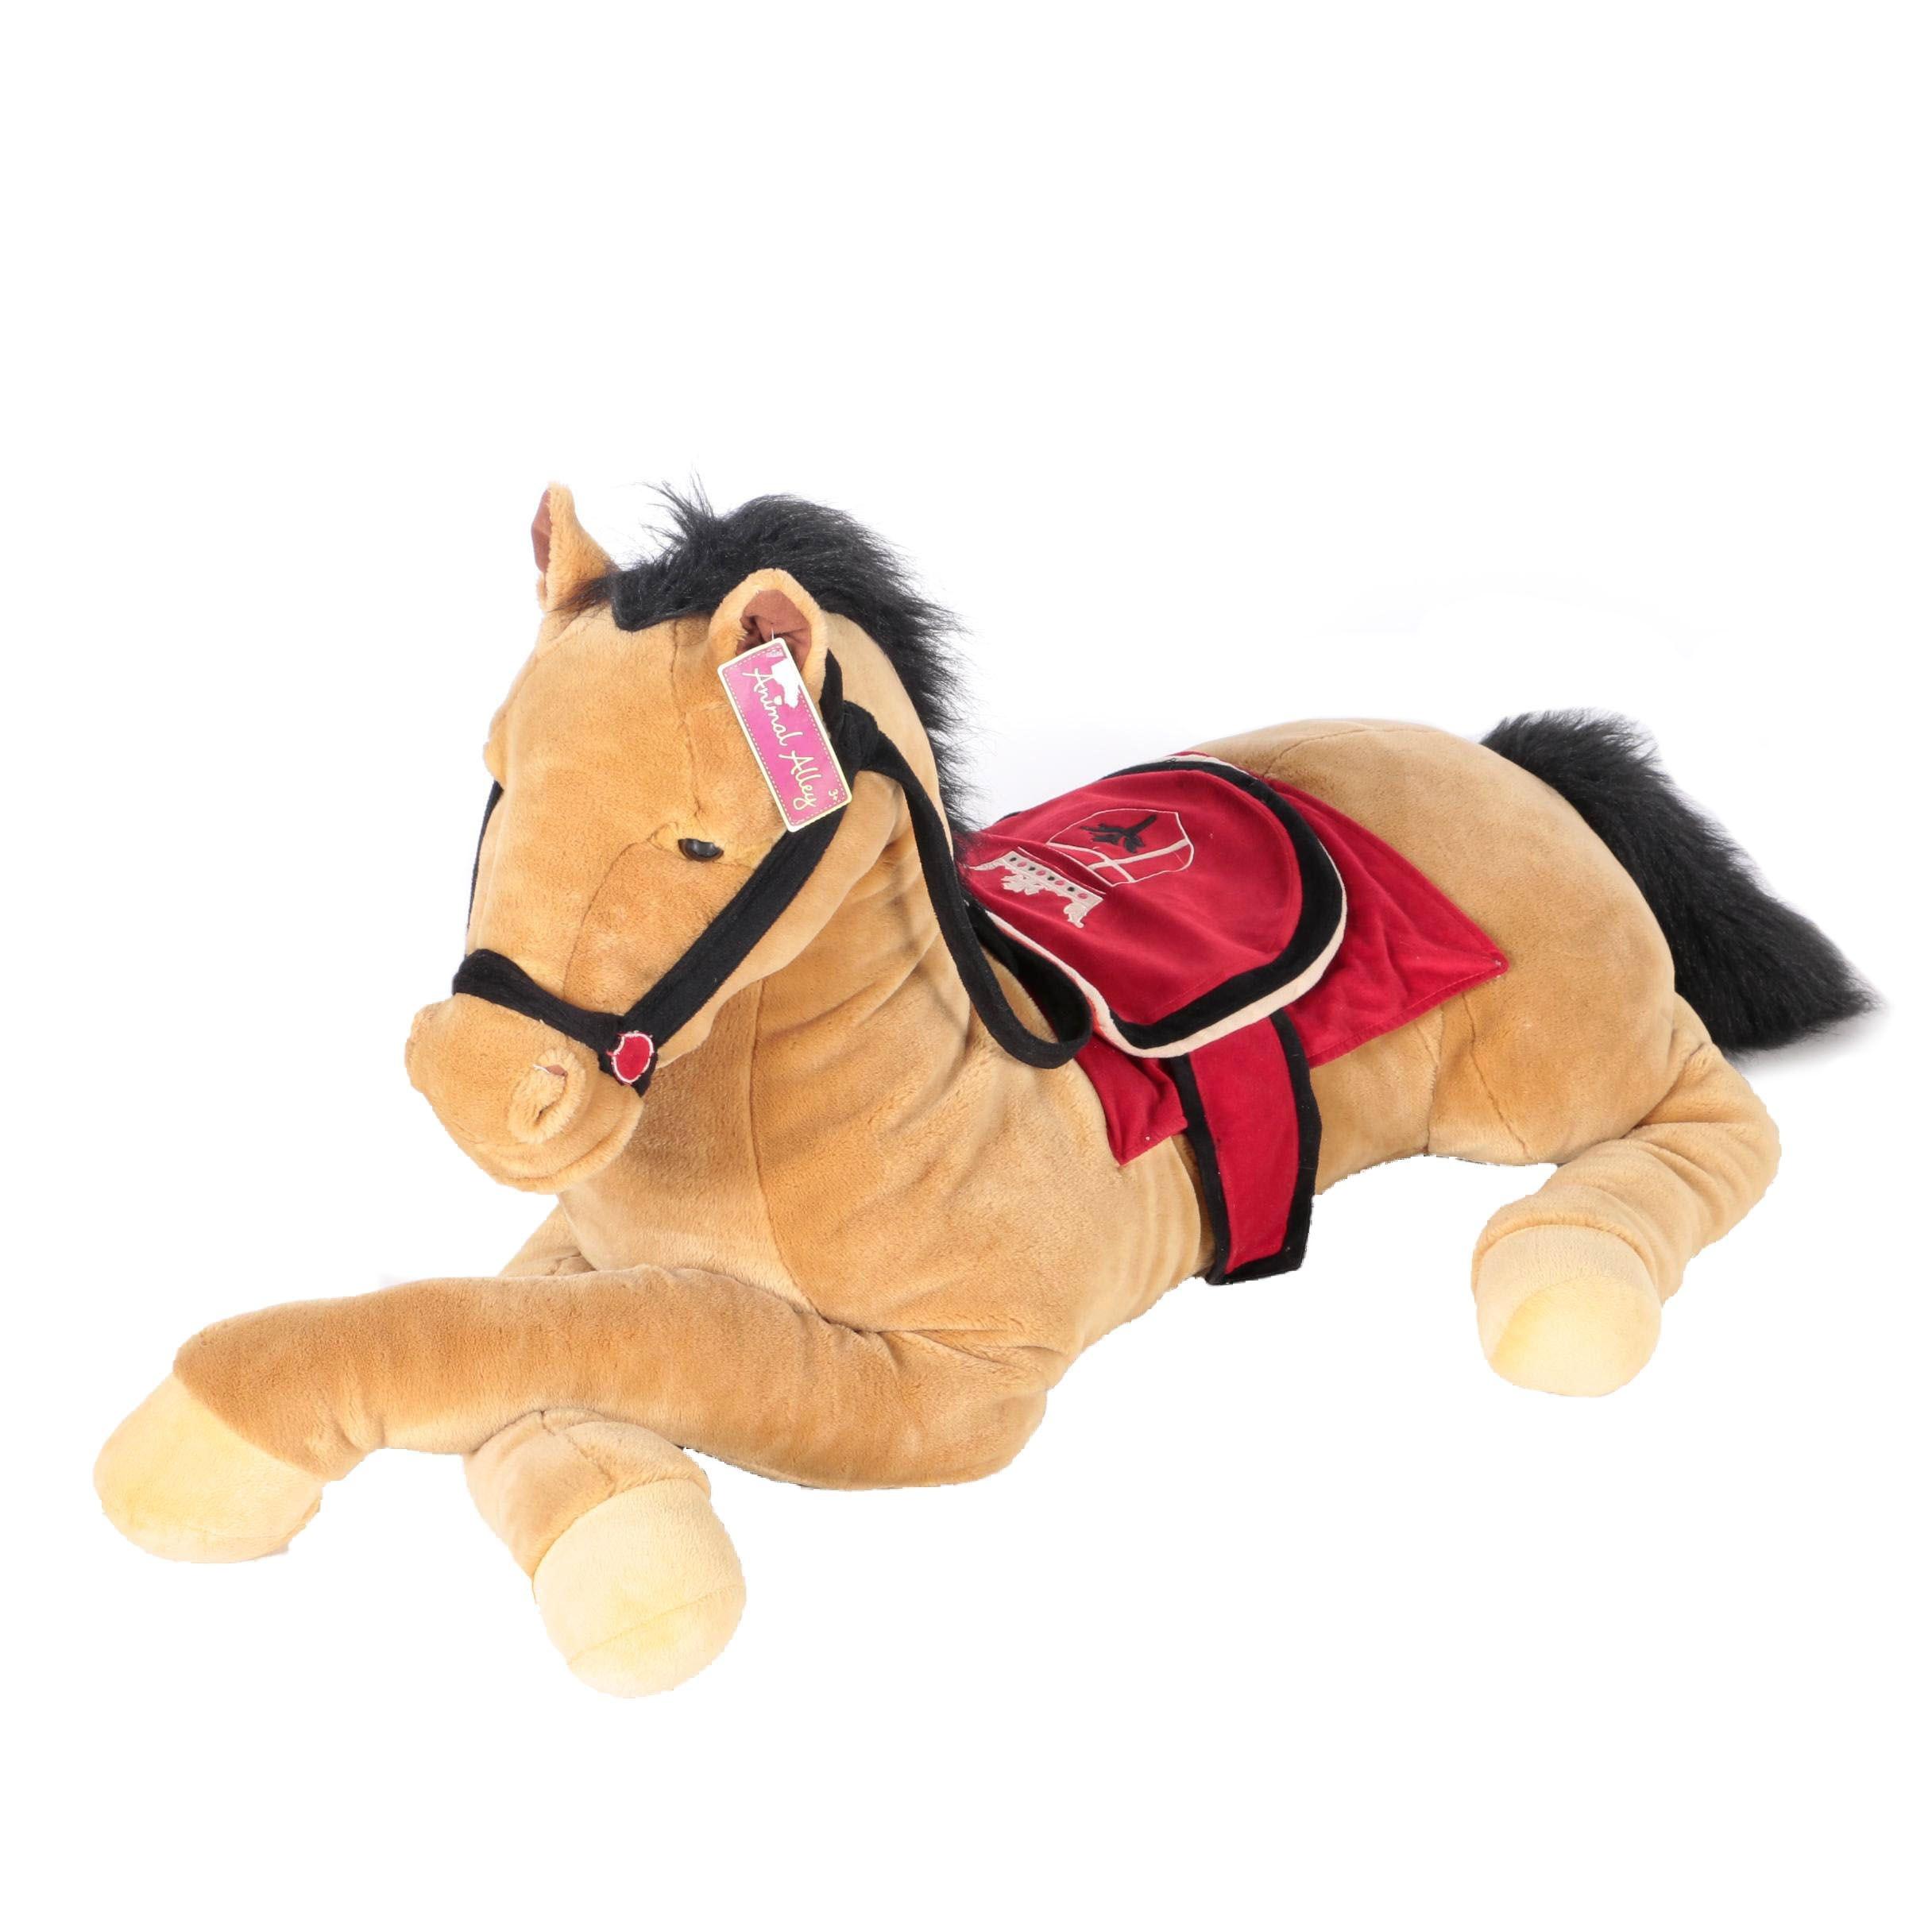 Animal Alley Plush Horse Ebth